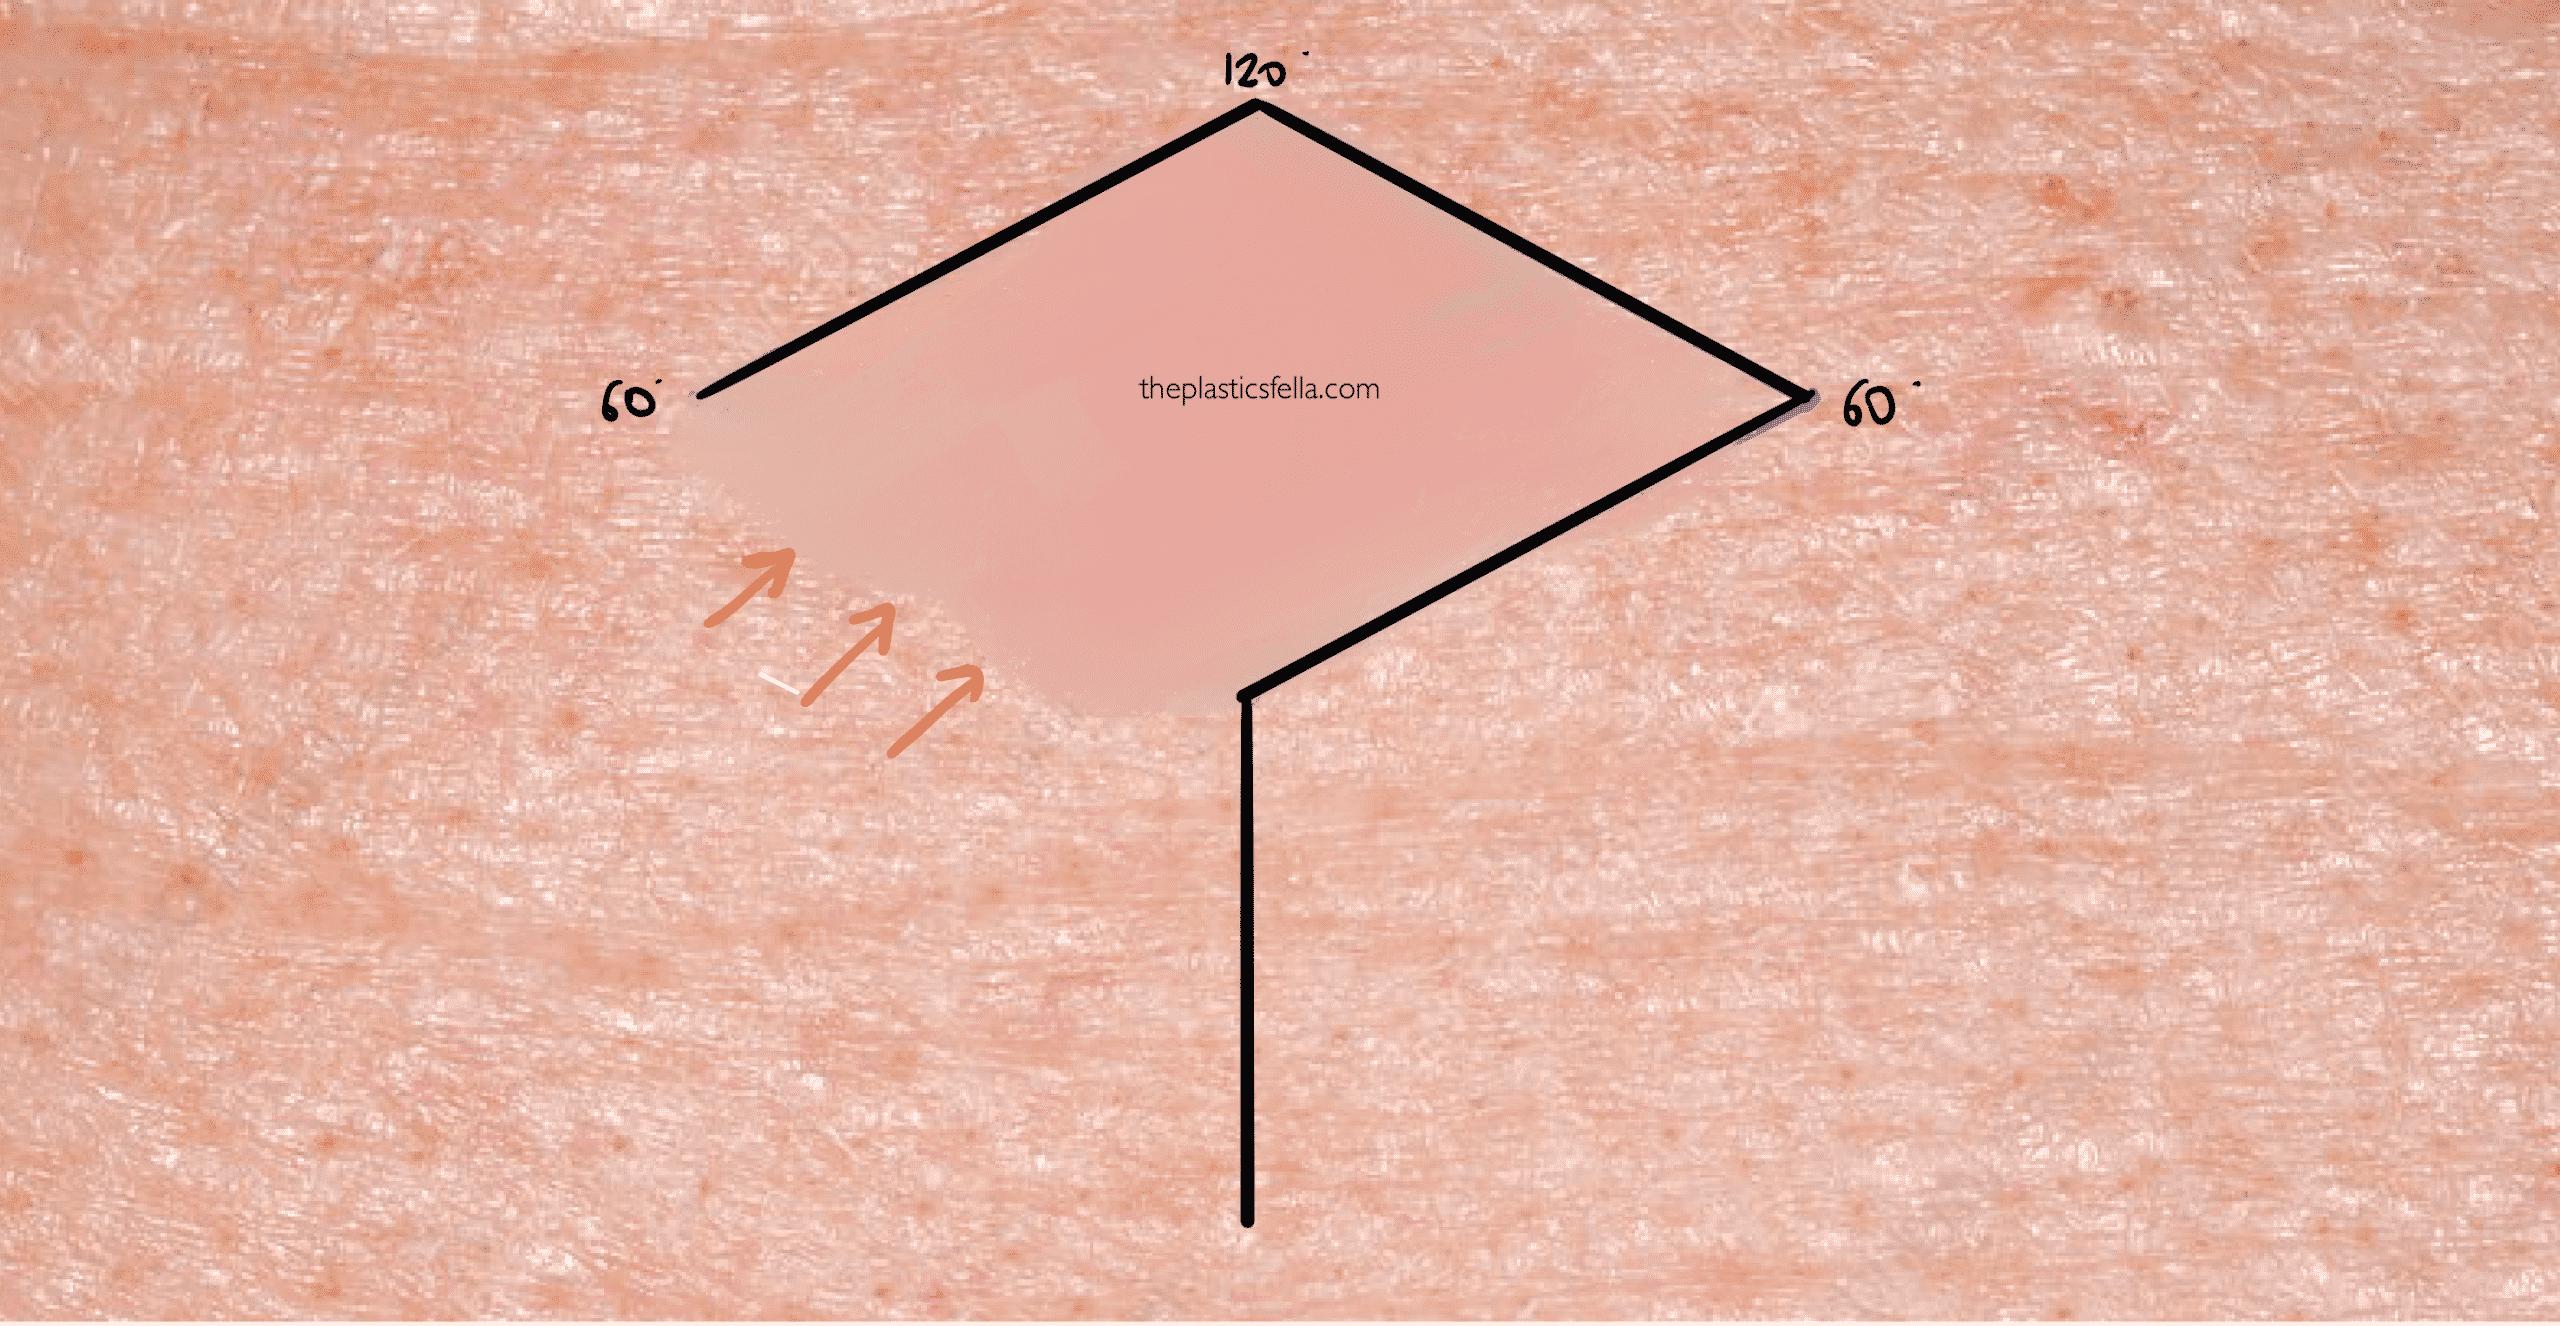 Drawing a rhomboid flap